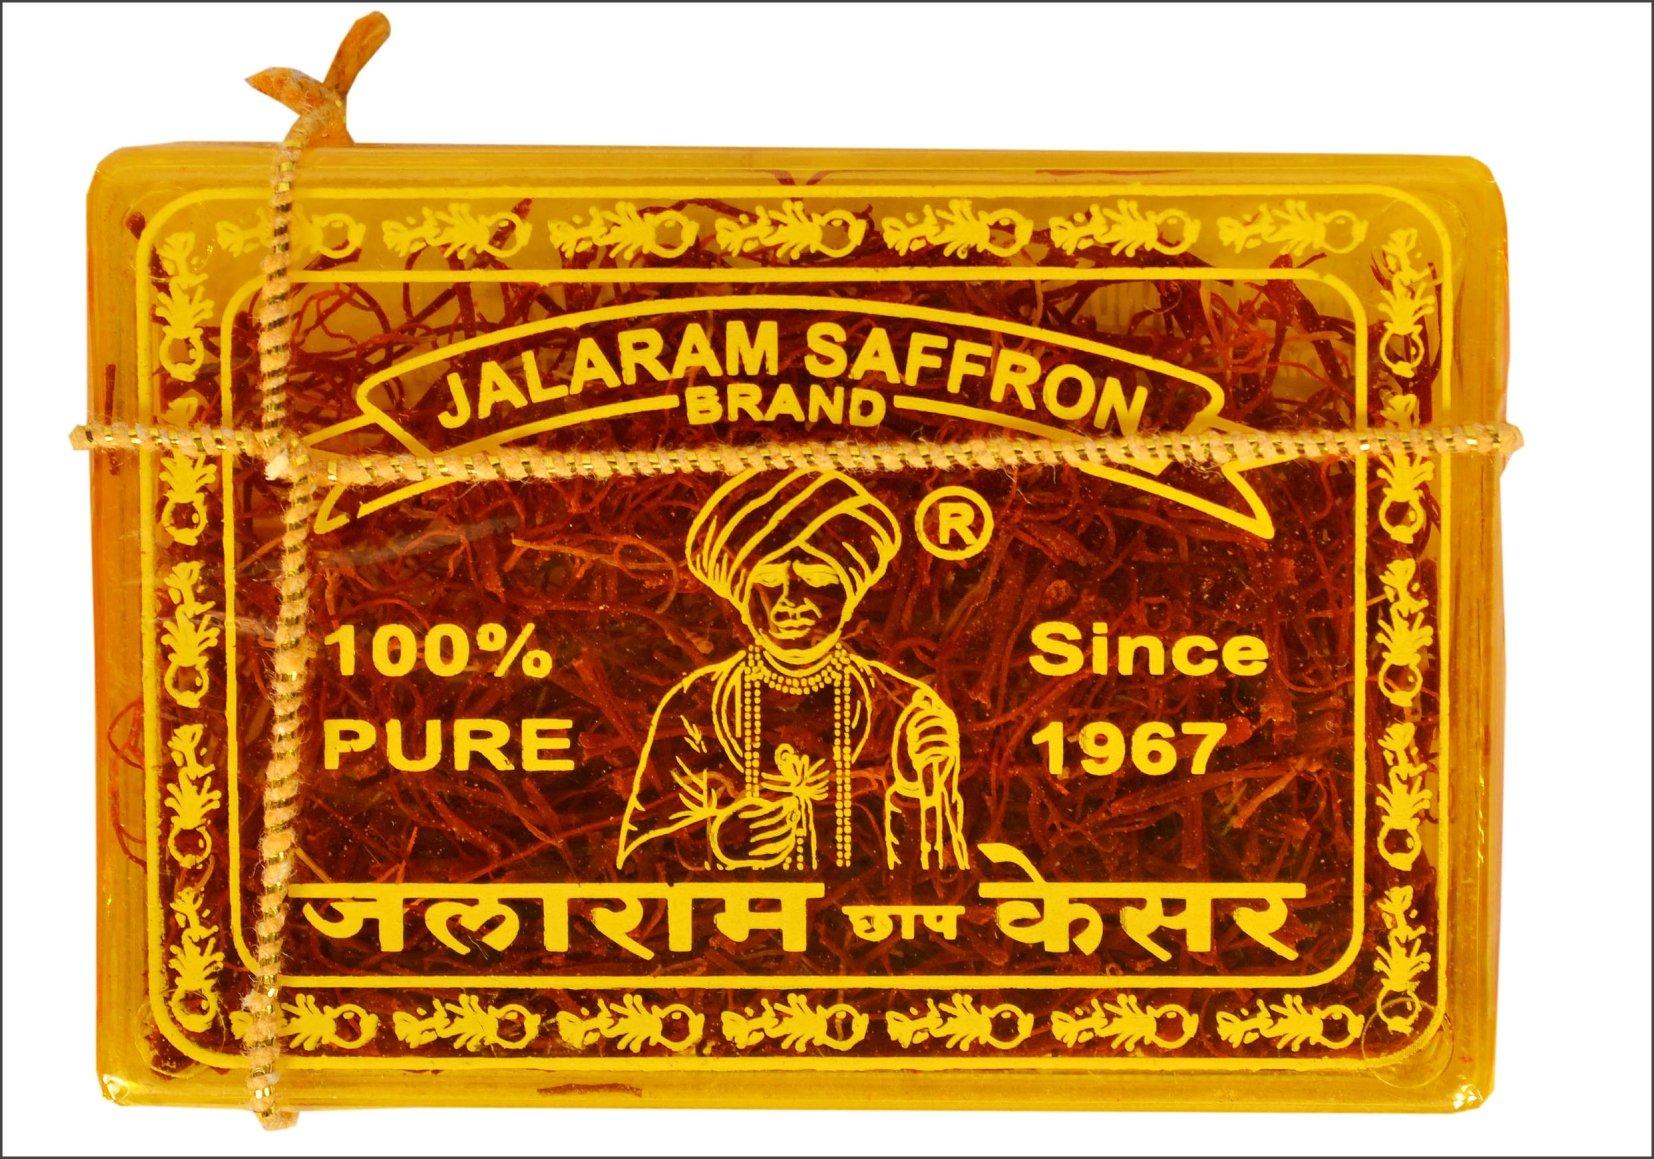 Jalaram Brand Saffron (Kesar) 100% Pure & Natural, 2 Gram